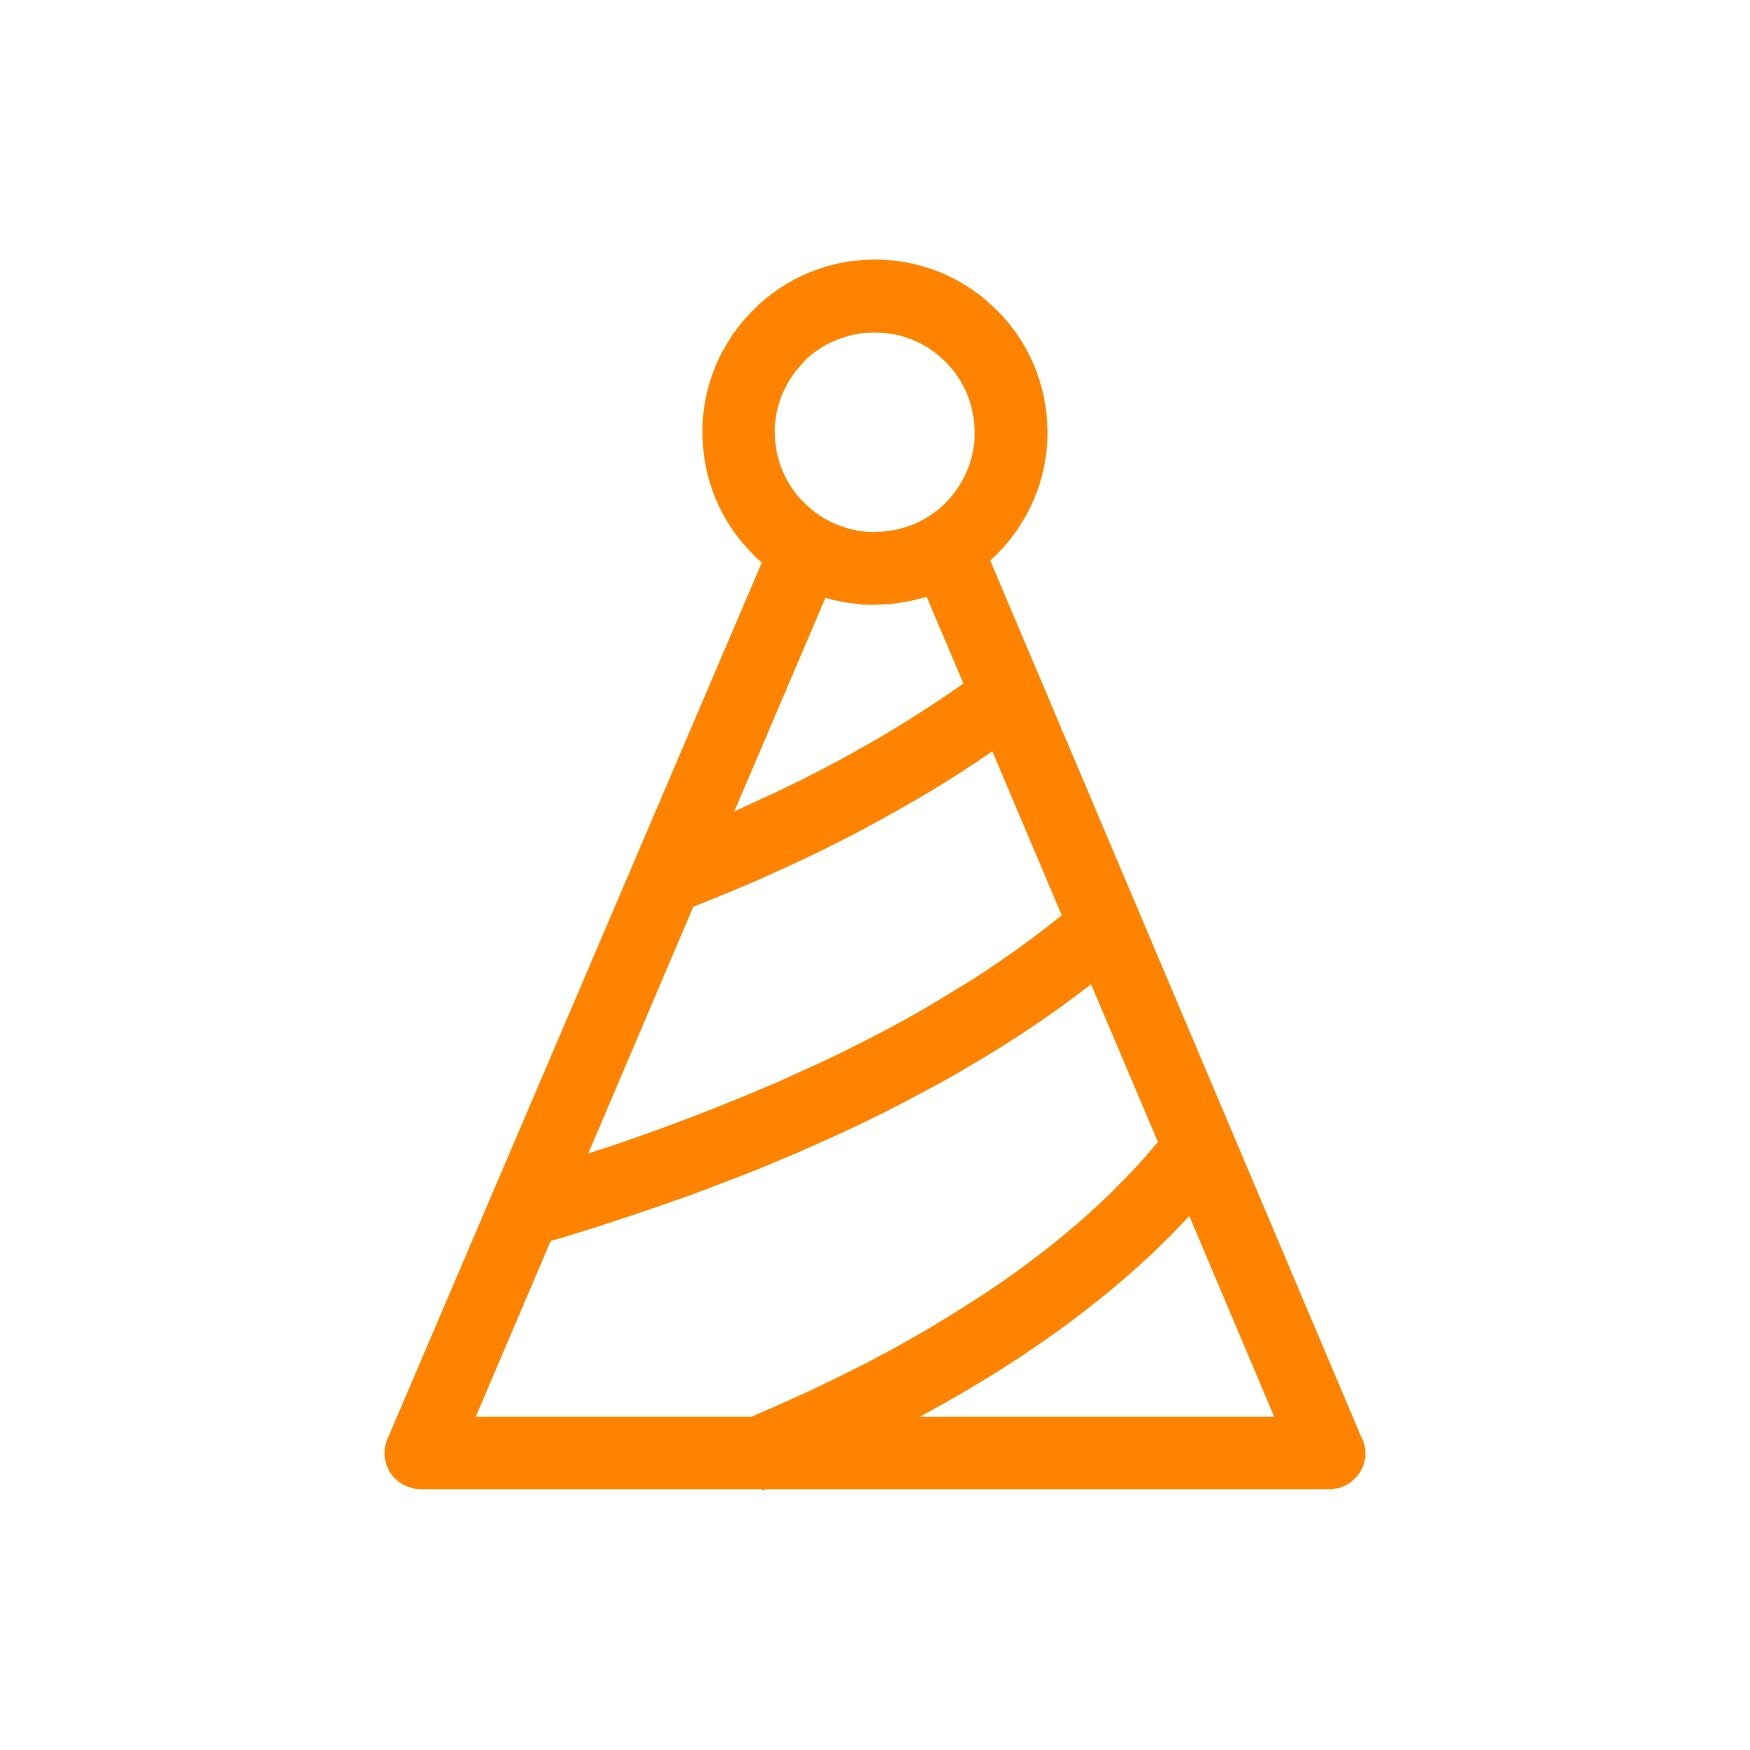 logo+%2862%29.jpg